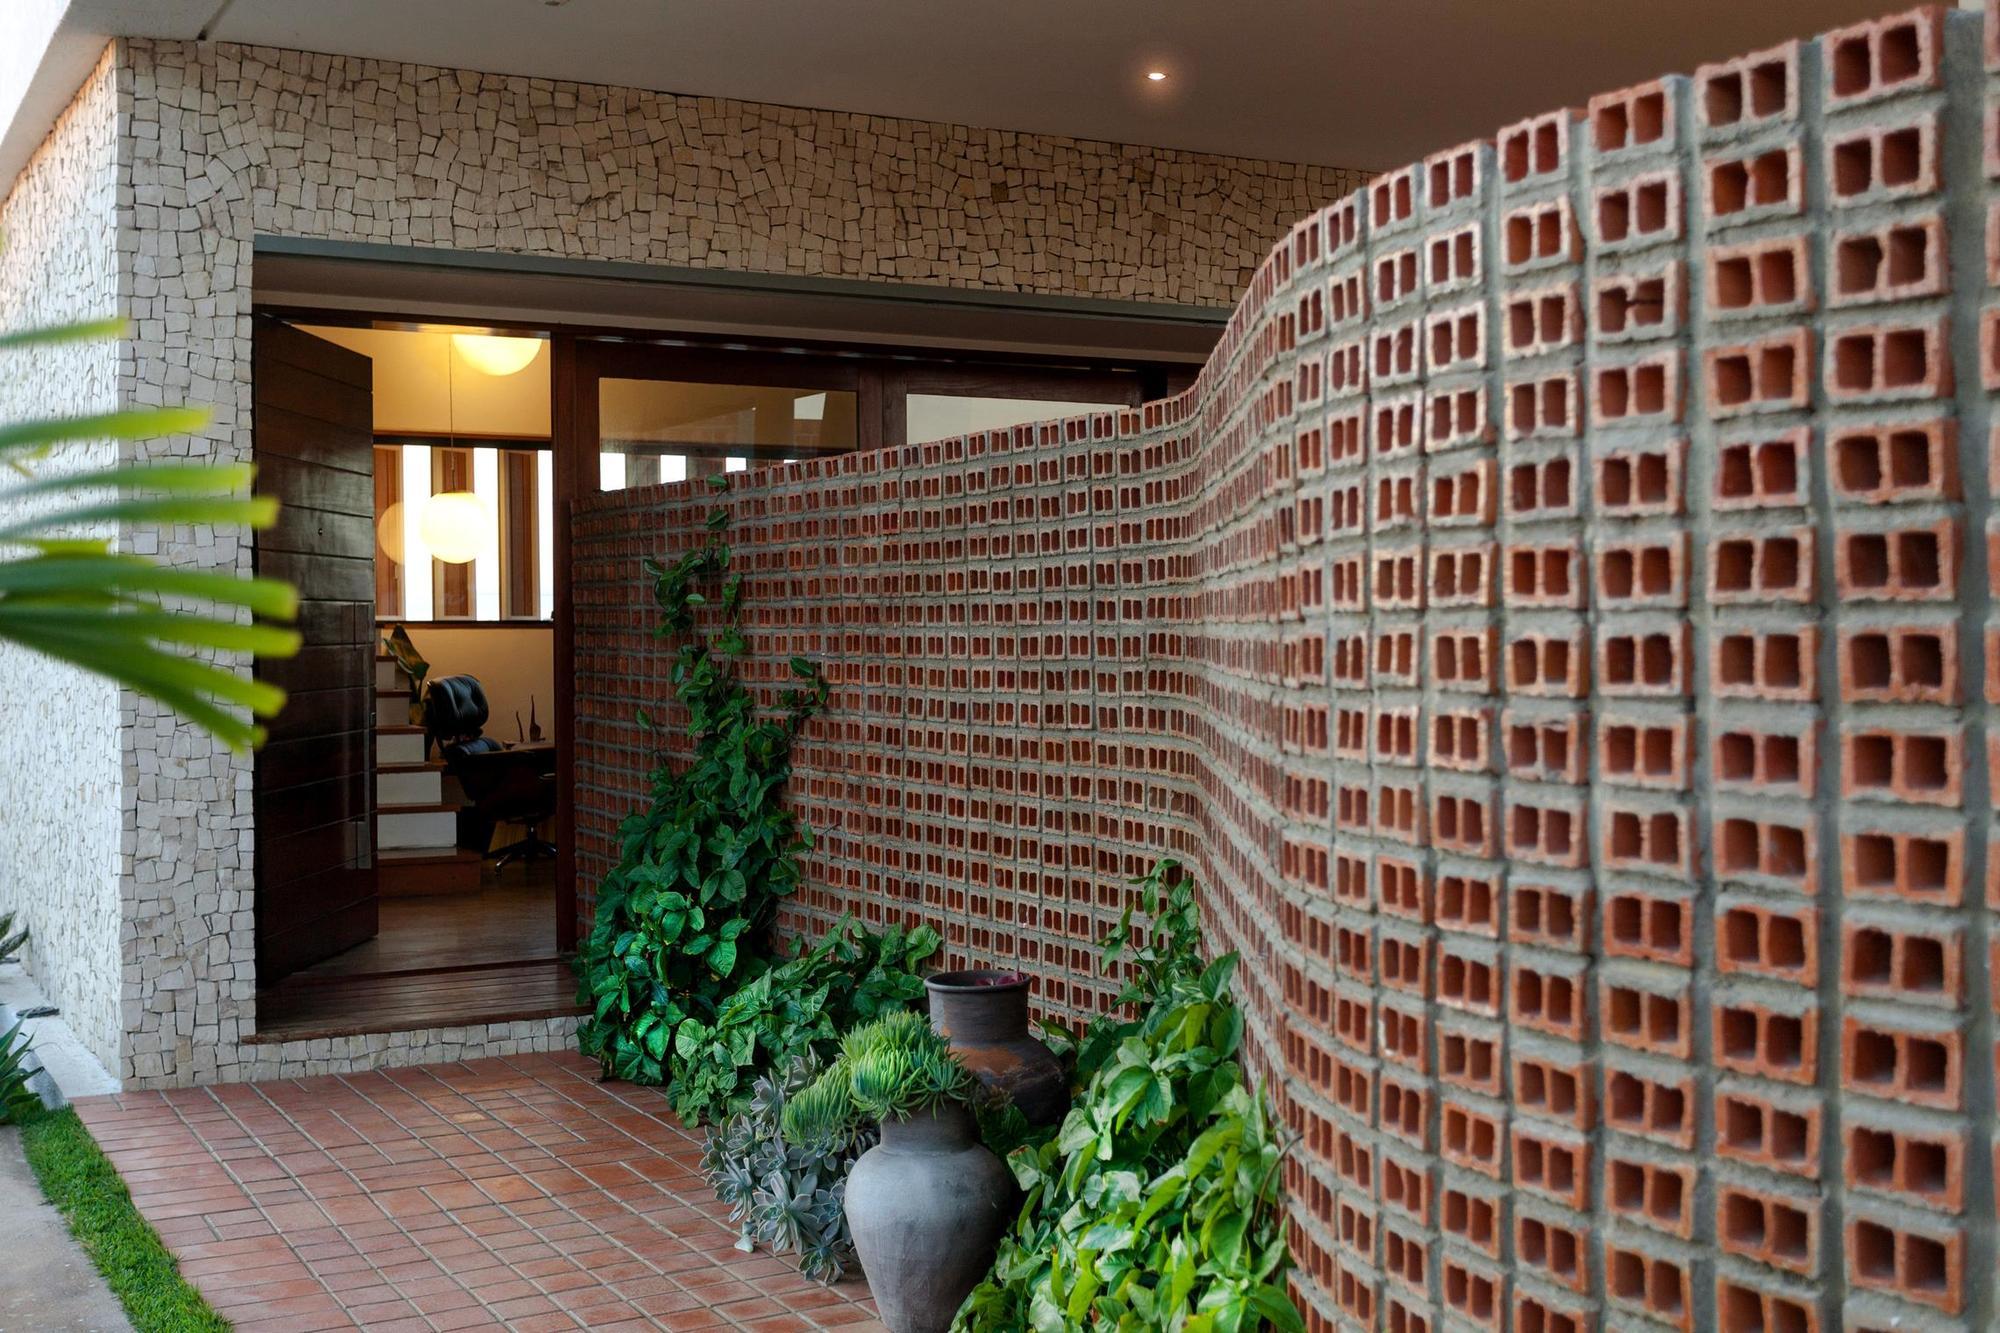 5448473de58eceb567000184_architect-s-house-jirau-arquitetura__mg_9110